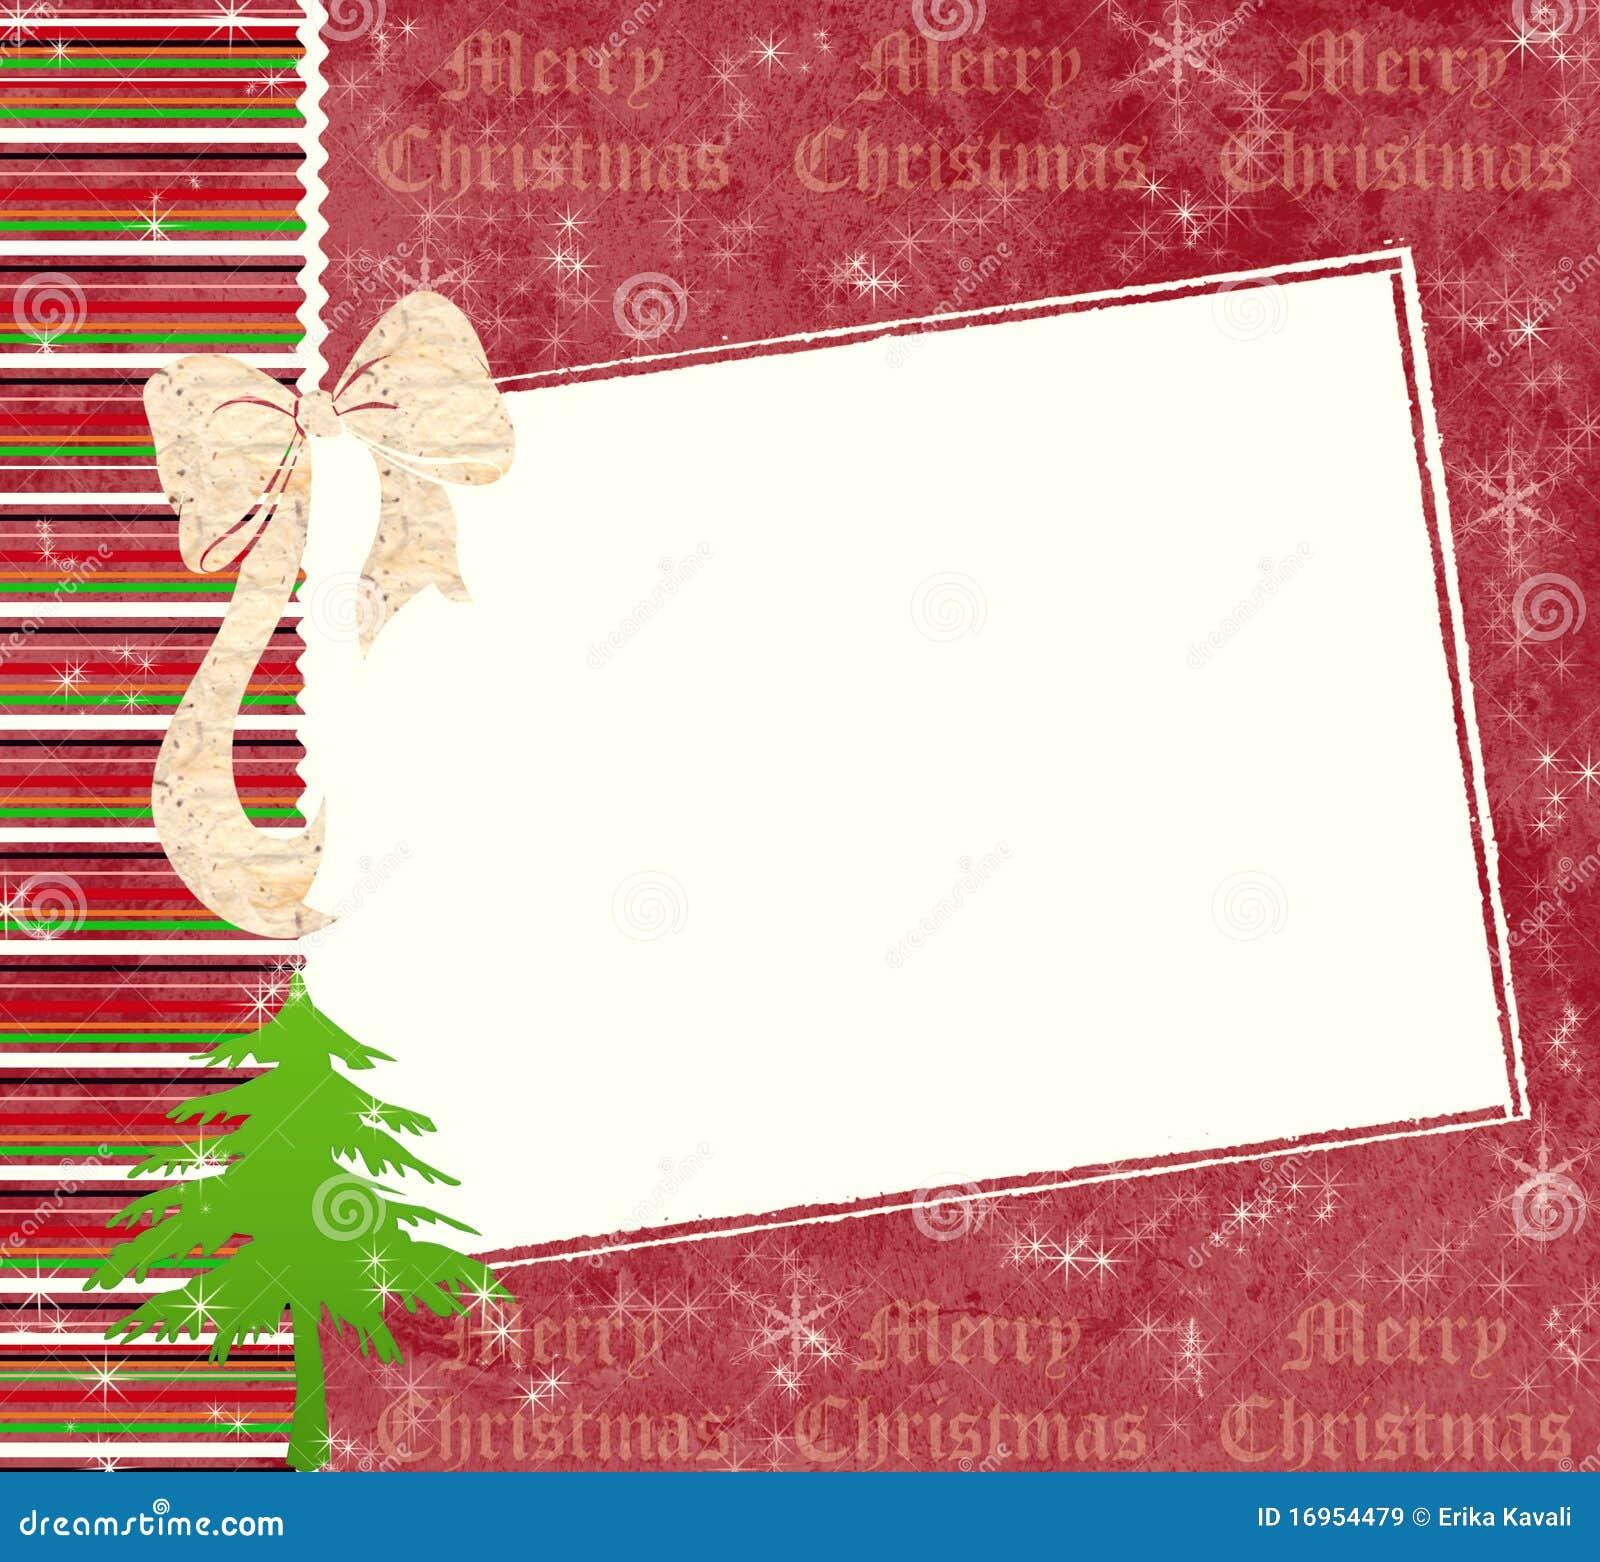 christmas songs kavali telugu lo